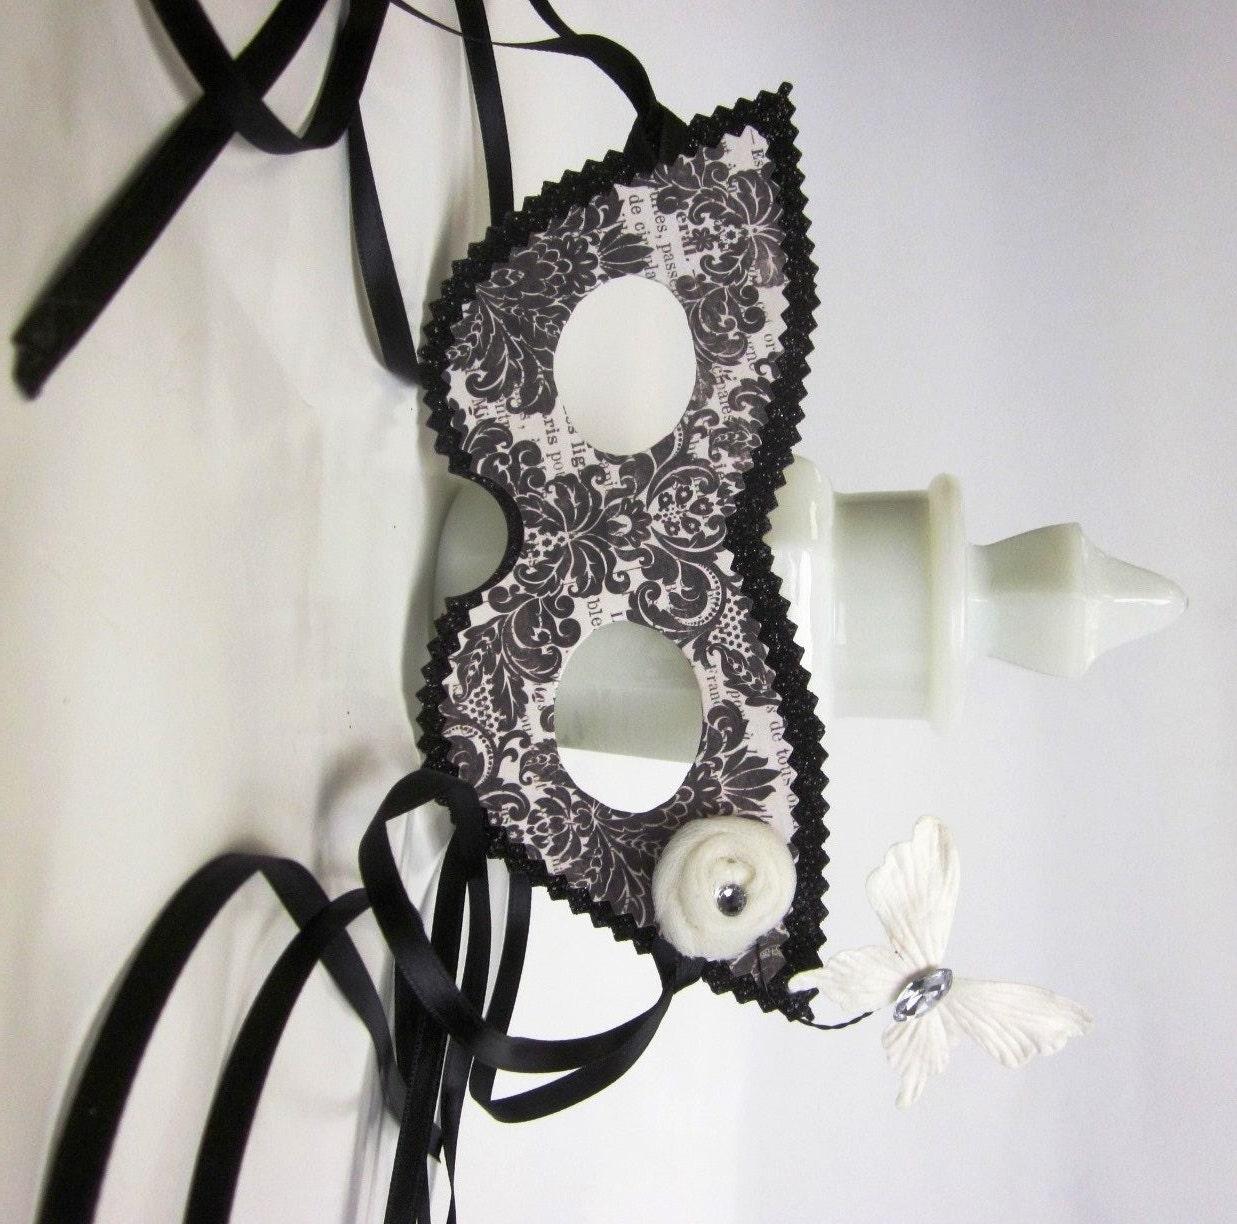 Black And White Damask Masquerade Ball Mask With Jeweled